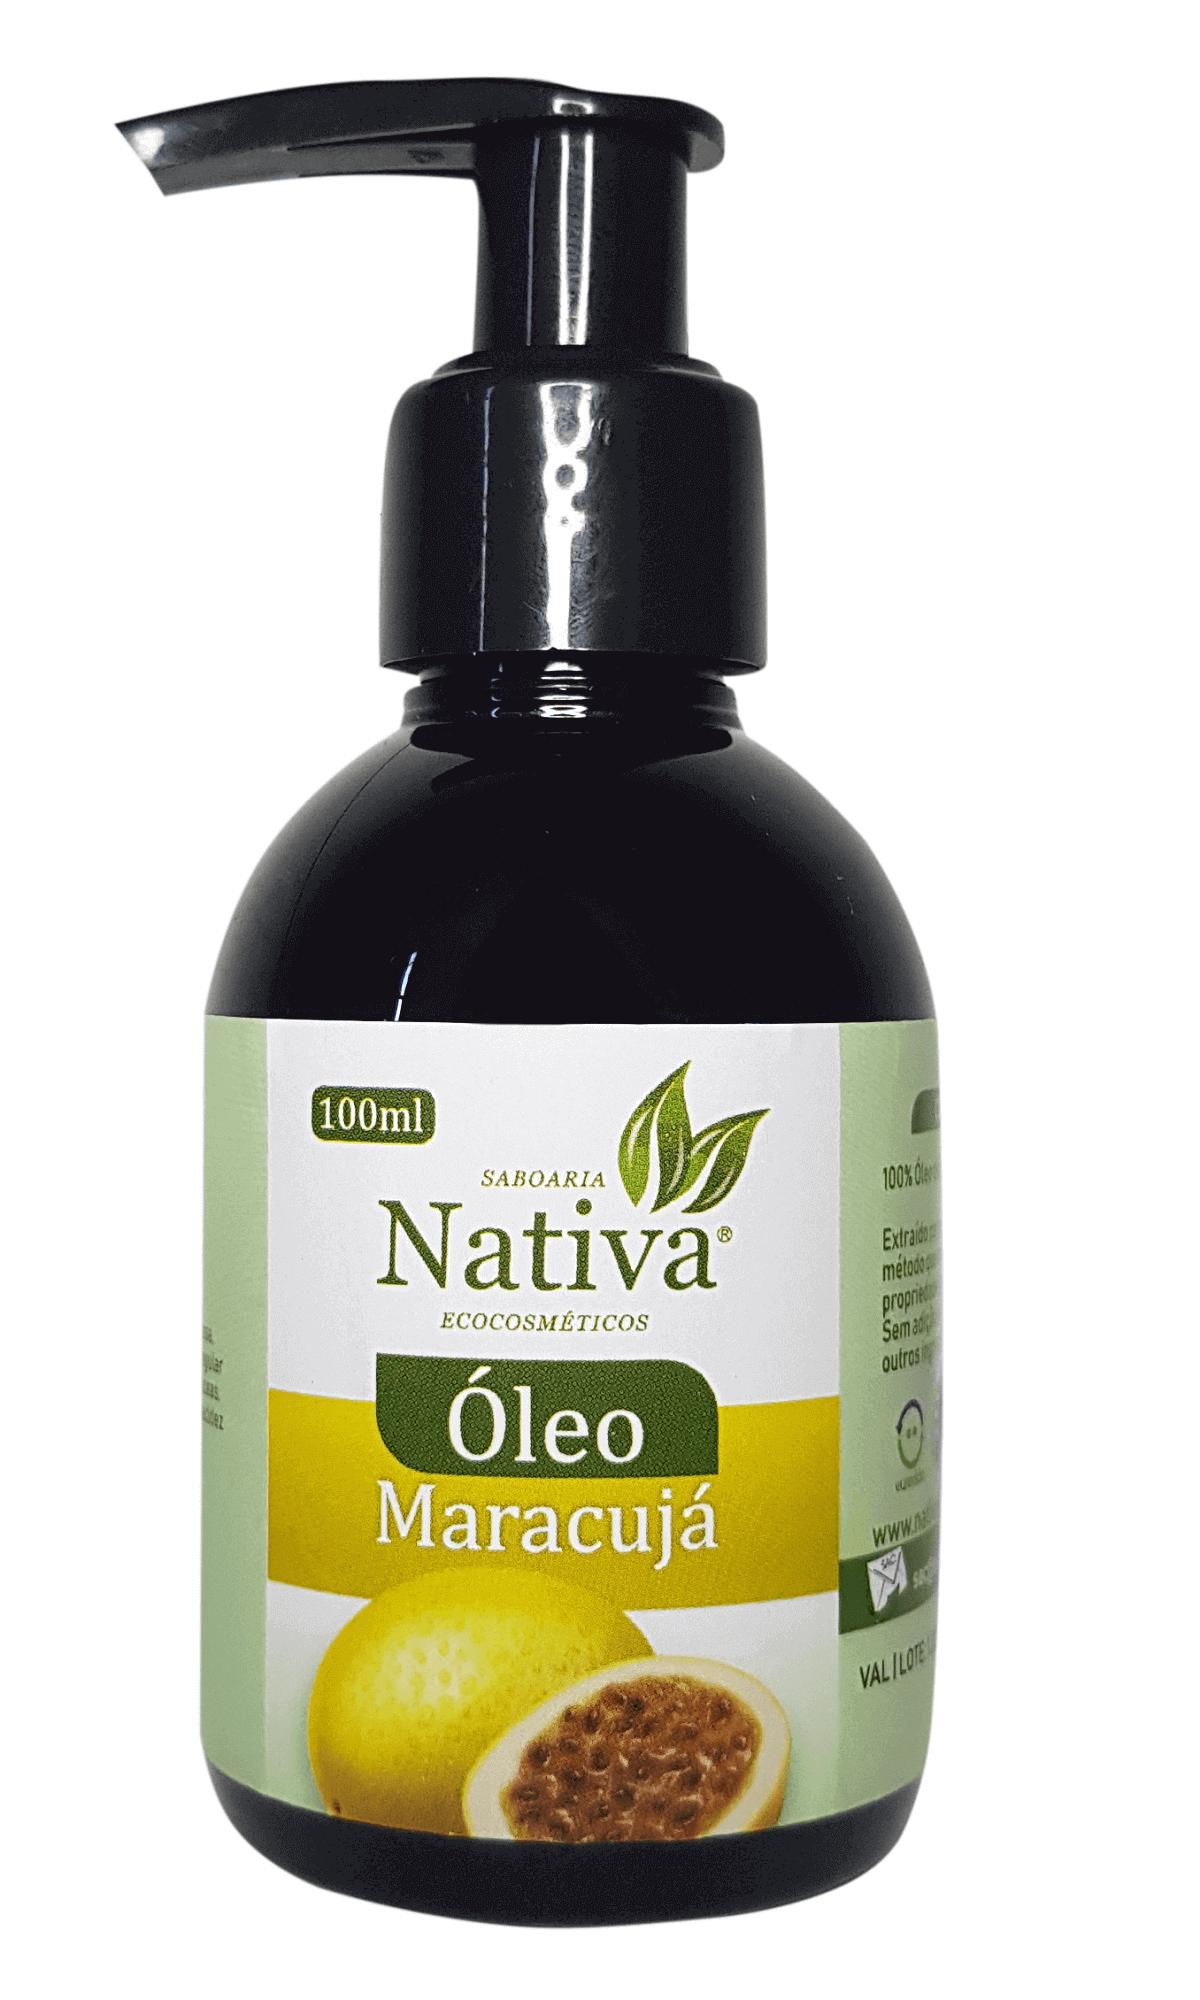 Óleo de Maracujá - 100ml  - Saboaria Nativa Ecocosméticos